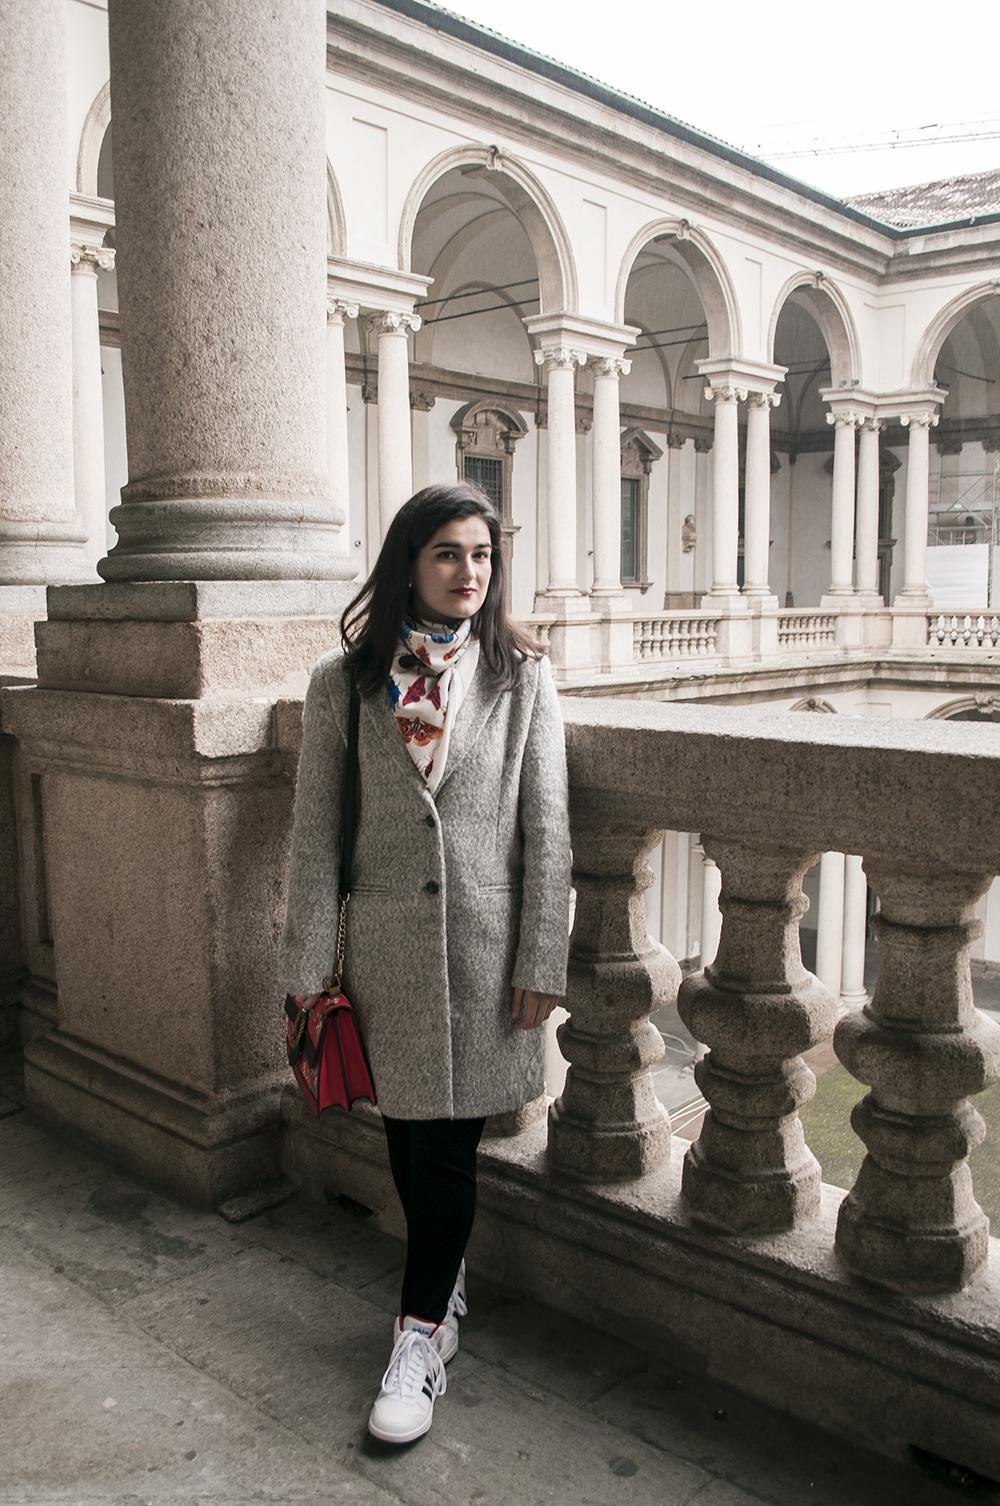 milano something fashion blogger valencia firenze italia bloggerspain ootd style whattowear ideas fashionbloggers_0102 copia